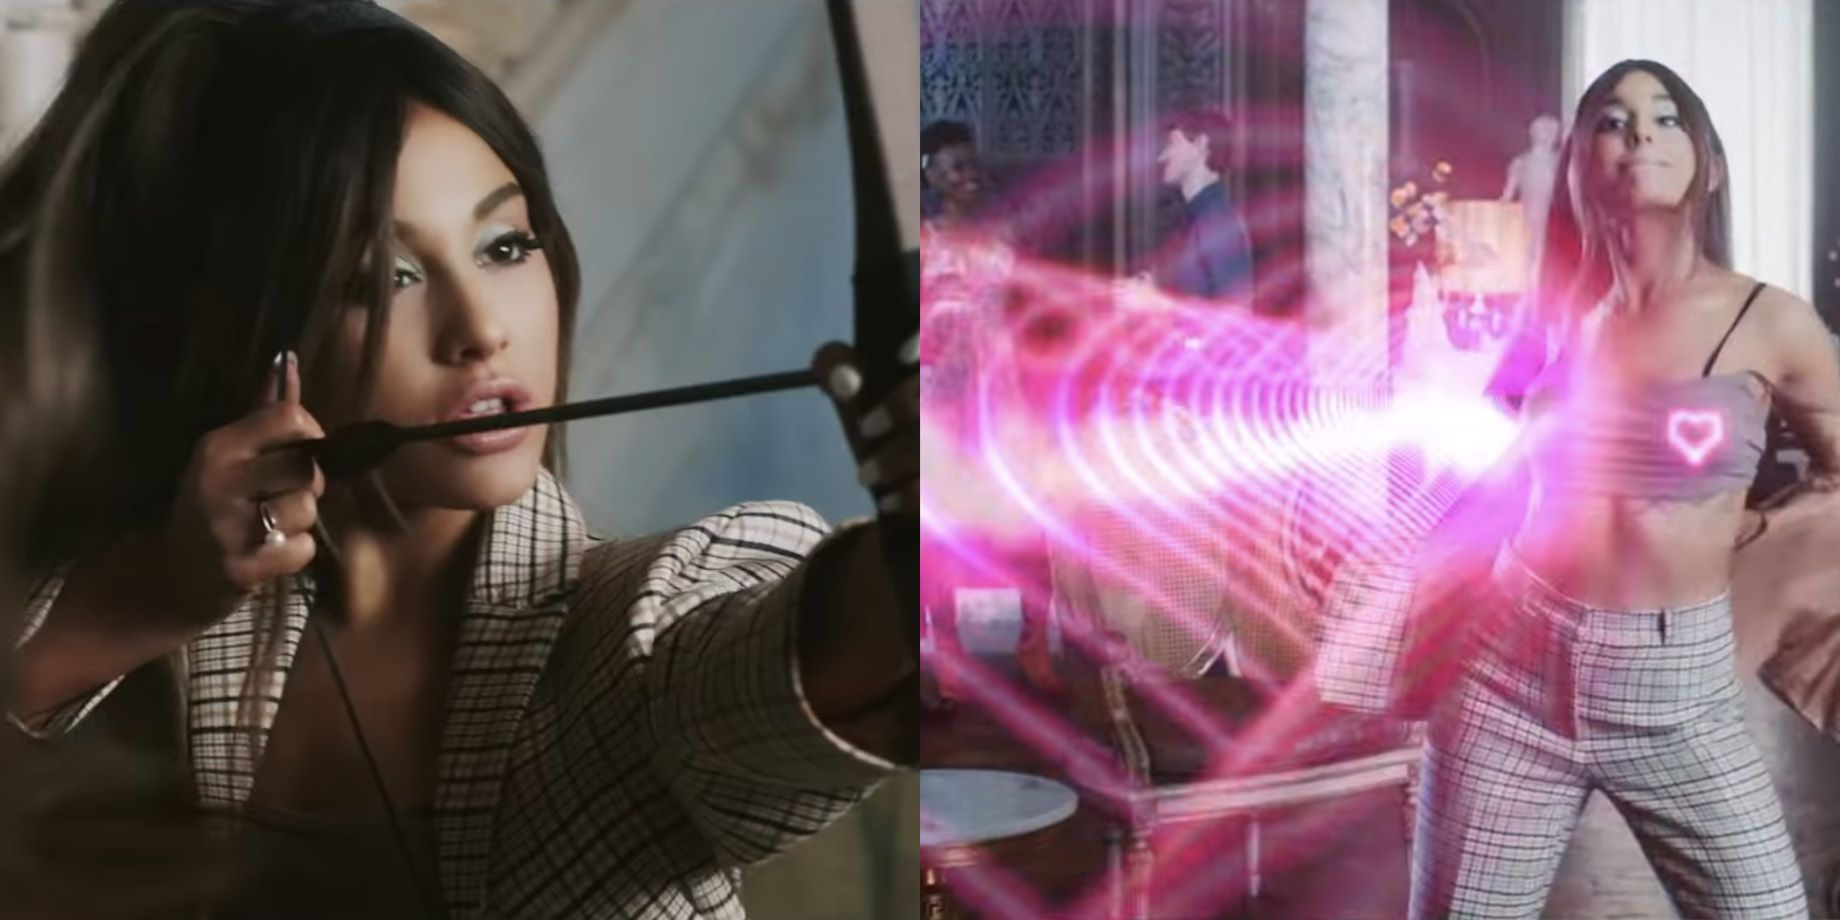 Ariana Grande S Boyfriend Lyrics Explore Crushes Flirtations # перевод песни 34+35 (ariana grande). ariana grande s boyfriend lyrics